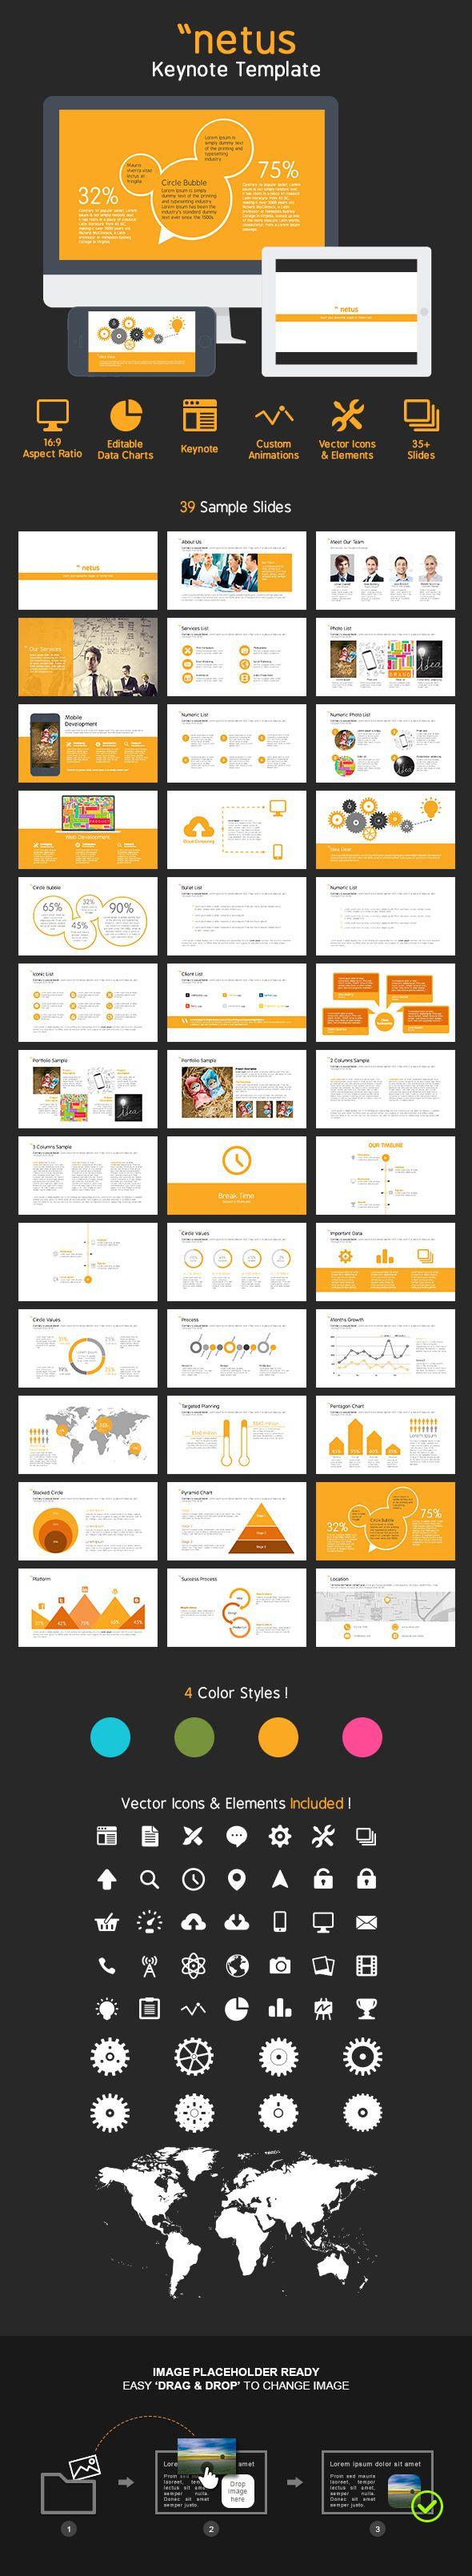 Keynote Presentation Template #keynote #keynotetemplate #presentationtemplate Download: http://graphicriver.net/item/netus-keynote-presentation-template/7447459?ref=ksioks